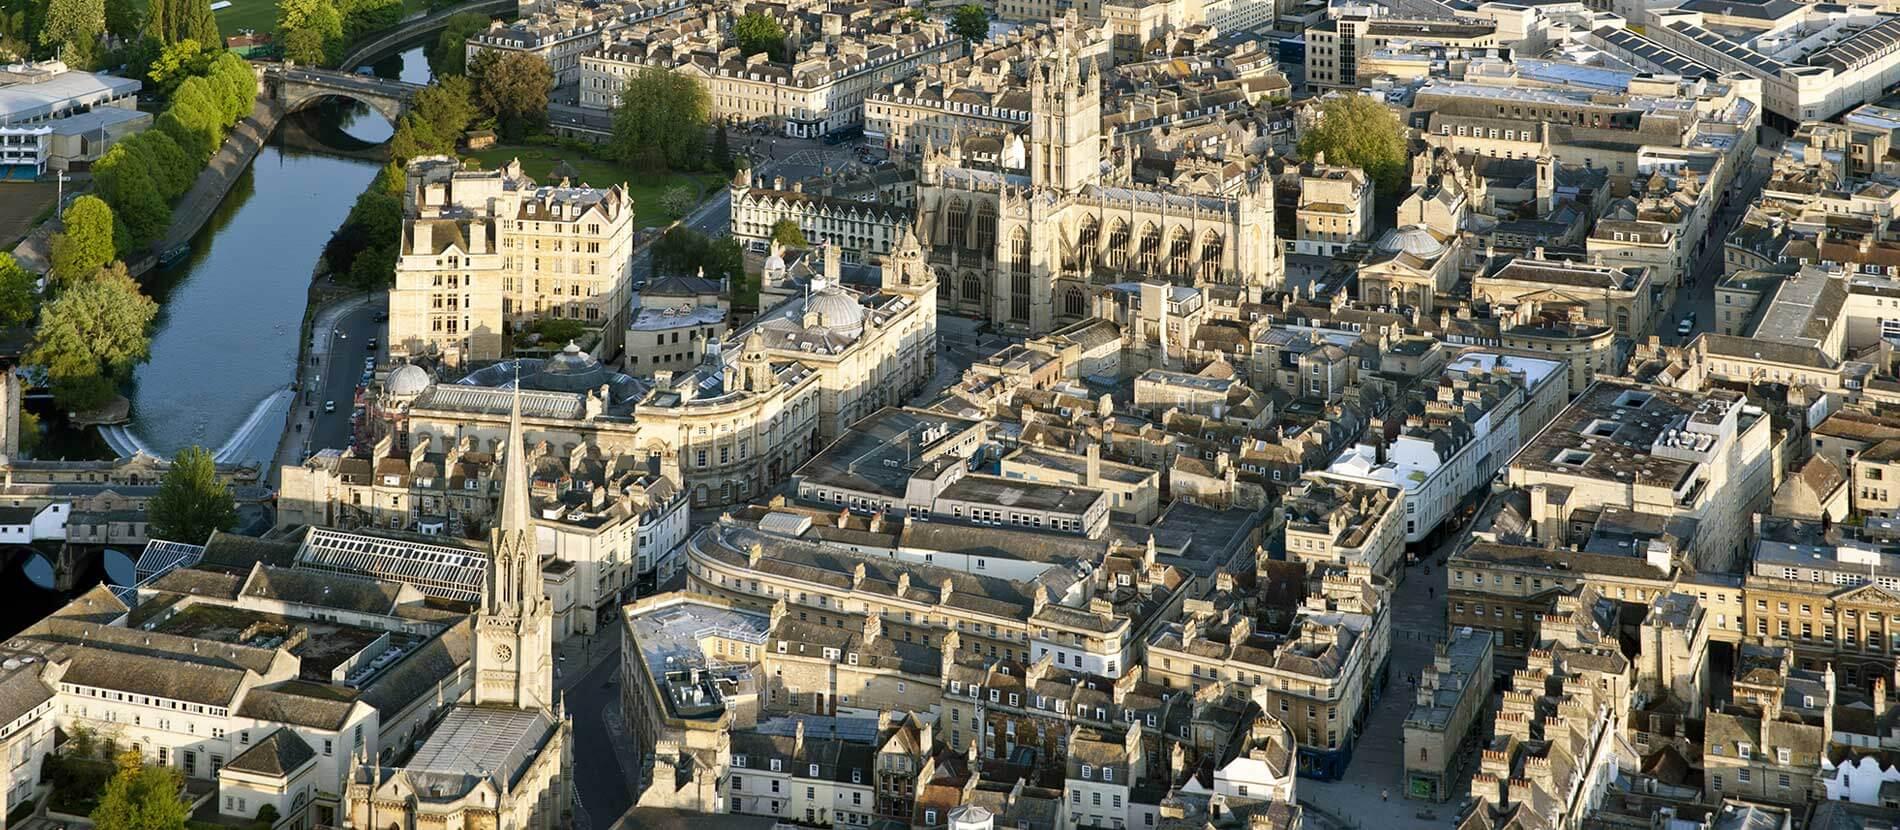 curso-de-ingles-para-adultos-en-Reino-Unido-Bath-Academy-ASTEX